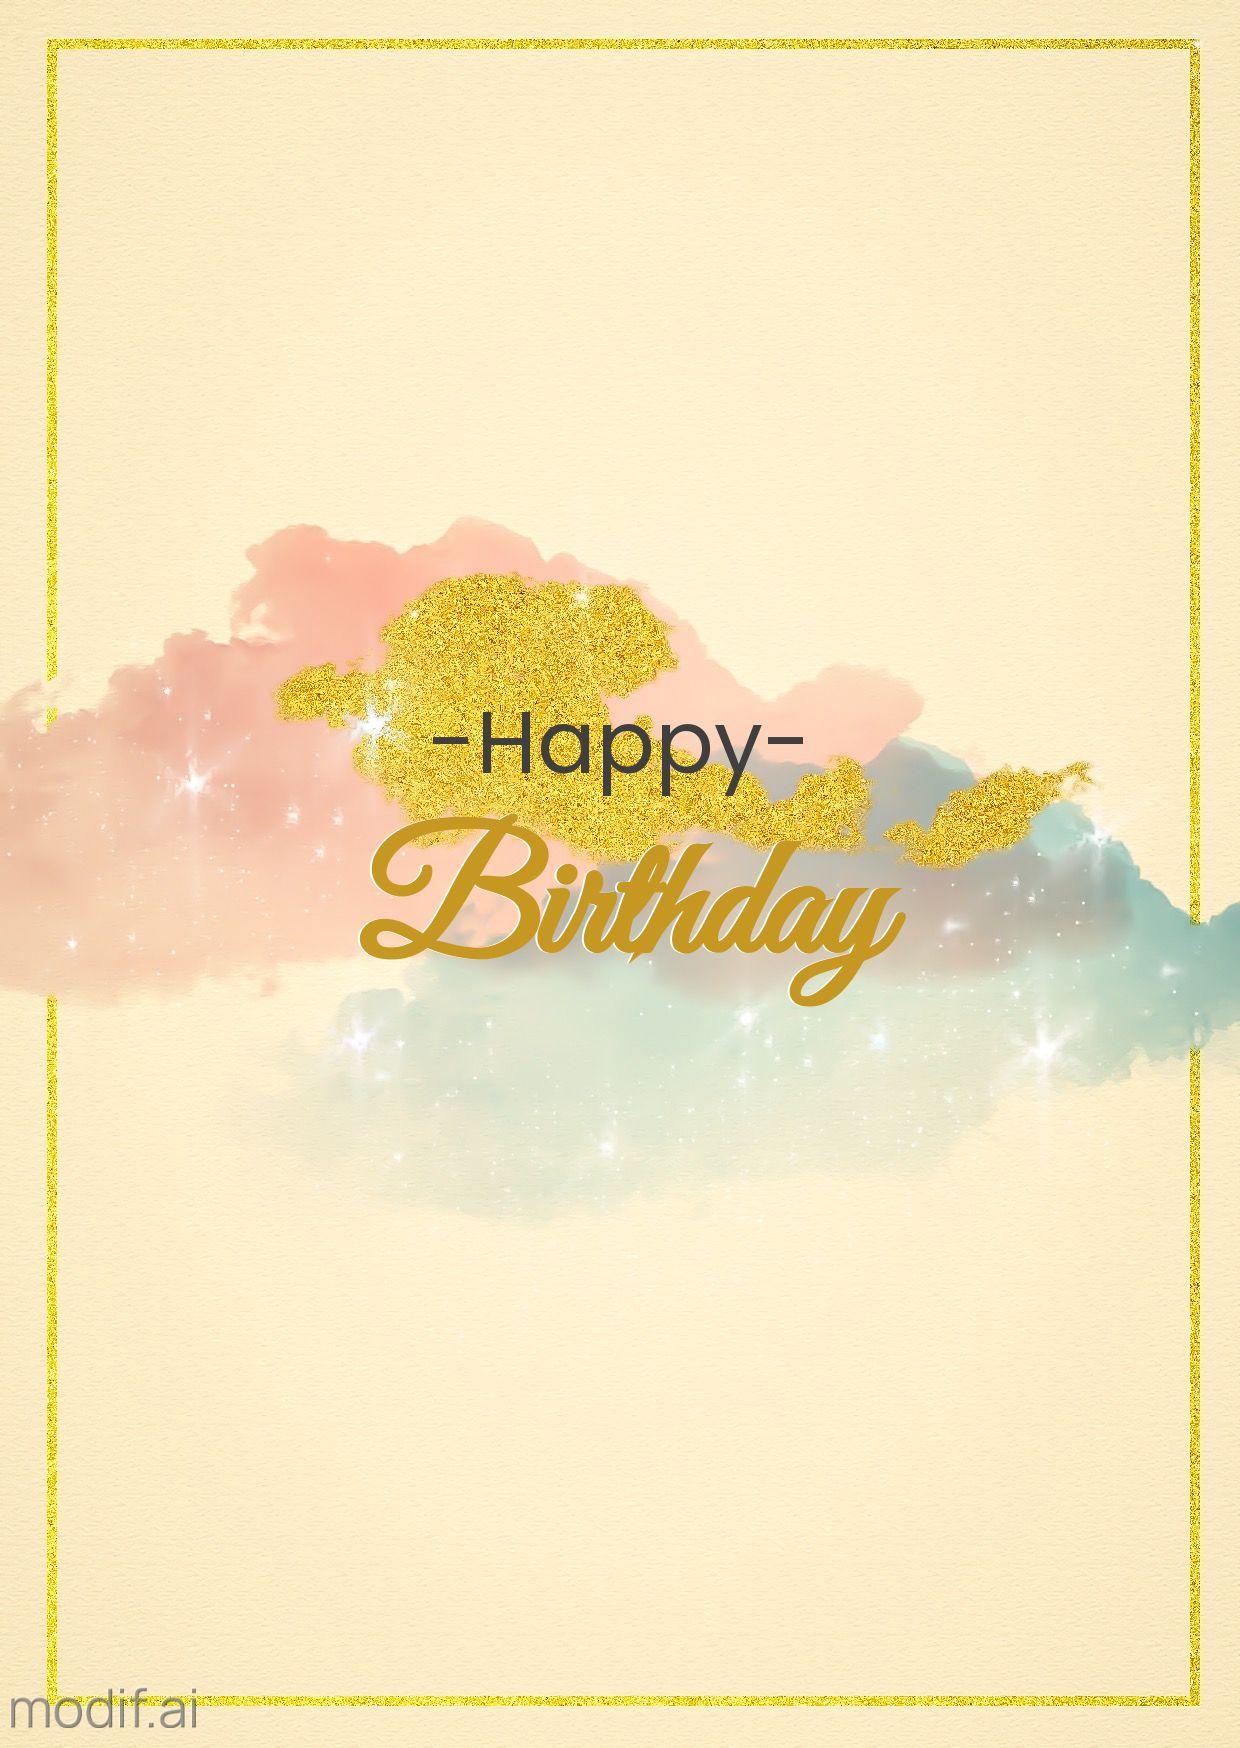 Sparkling Birthday Greeting Card Template